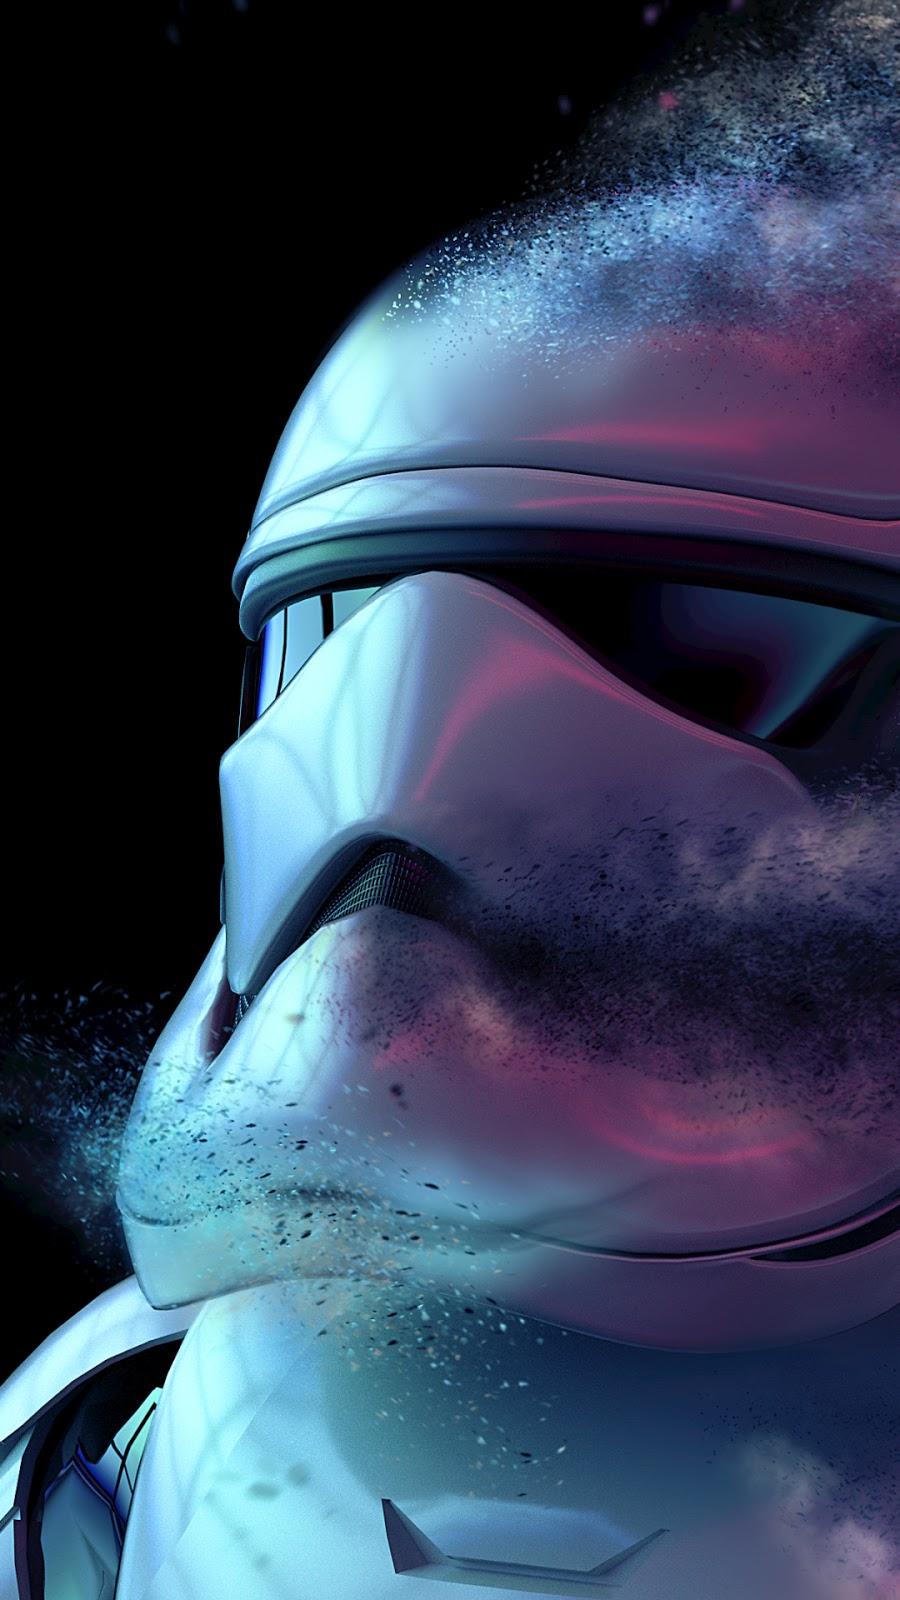 Star Wars Mobile Wallpaper Stormtrooper Wallpaper 4k 900x1600 Download Hd Wallpaper Wallpapertip